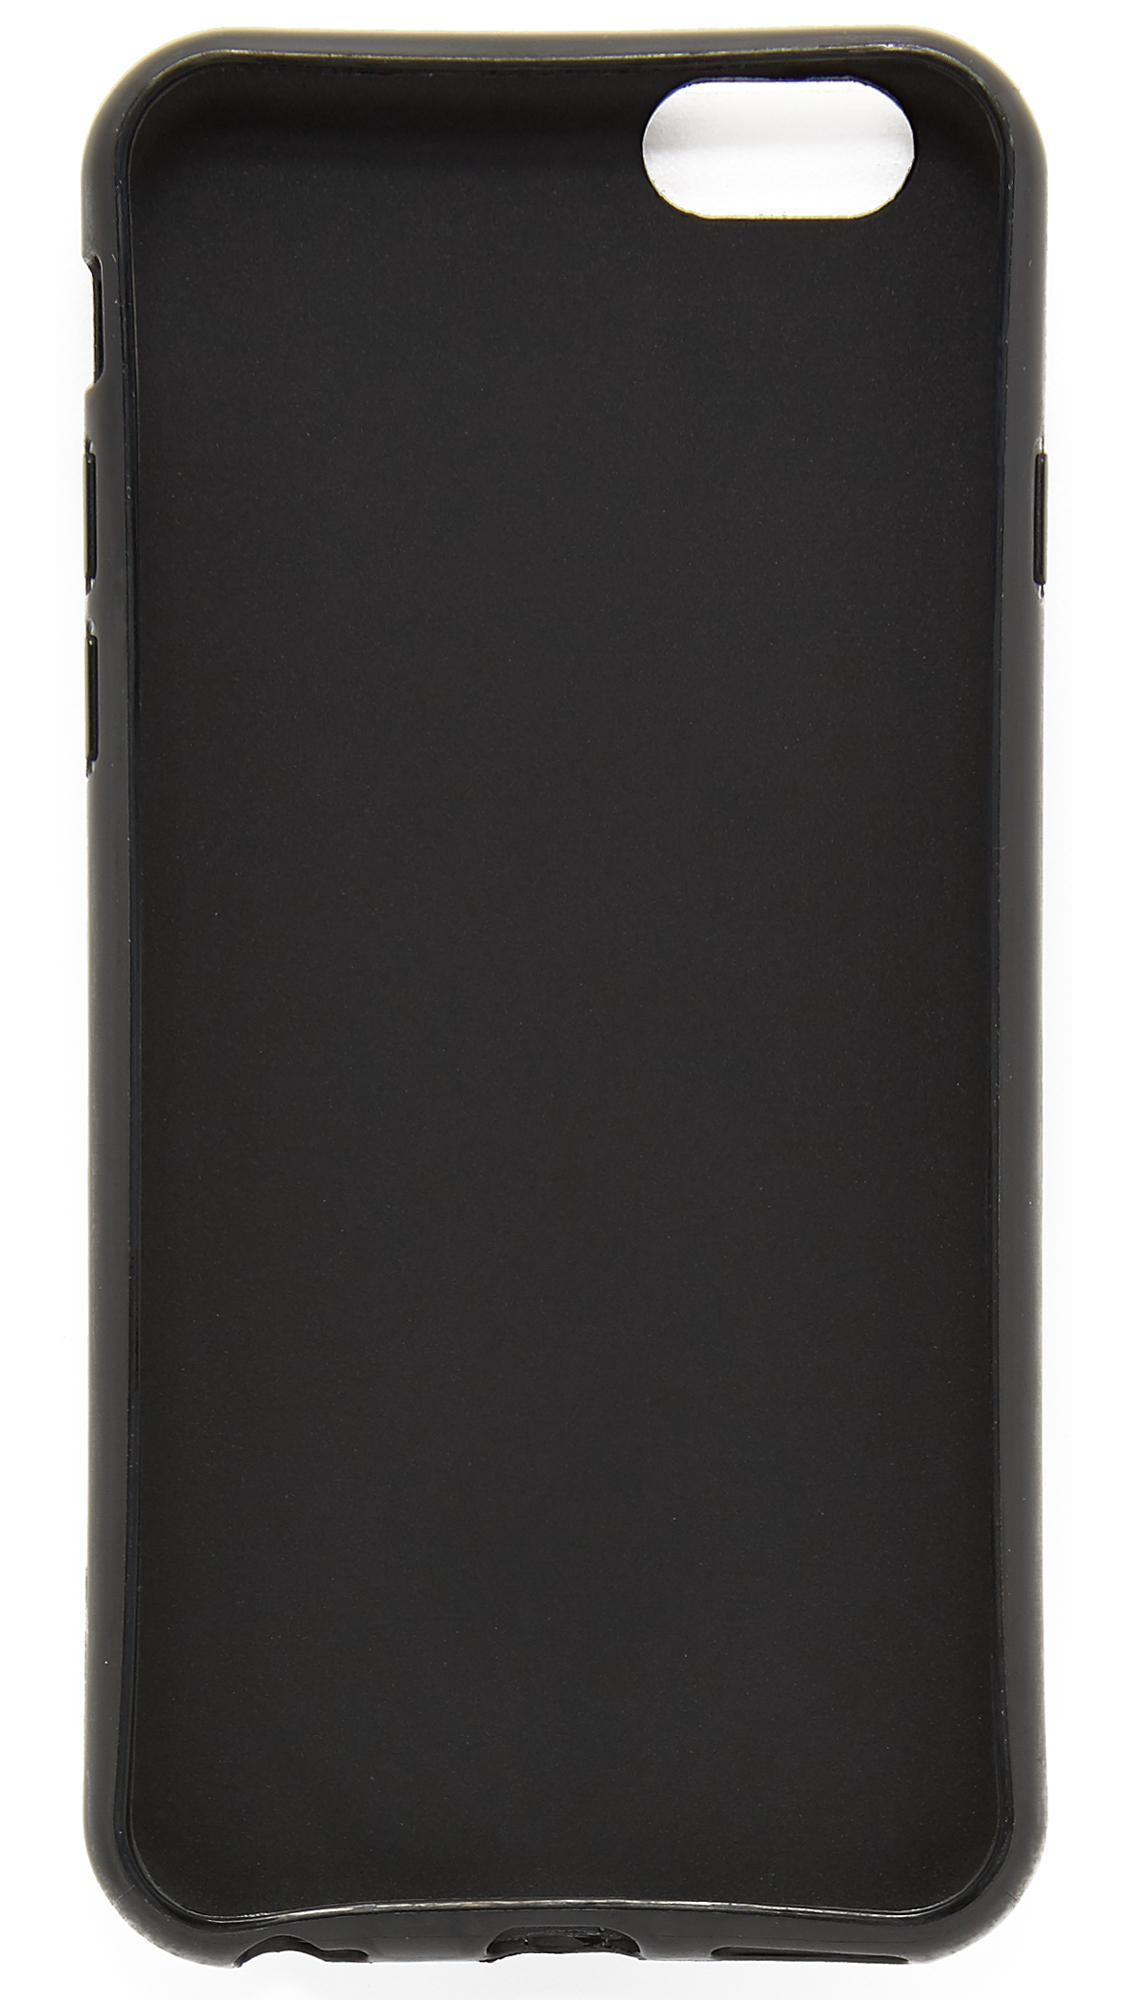 iphoria parfum au portable daisy iphone 6 6s case lyst. Black Bedroom Furniture Sets. Home Design Ideas